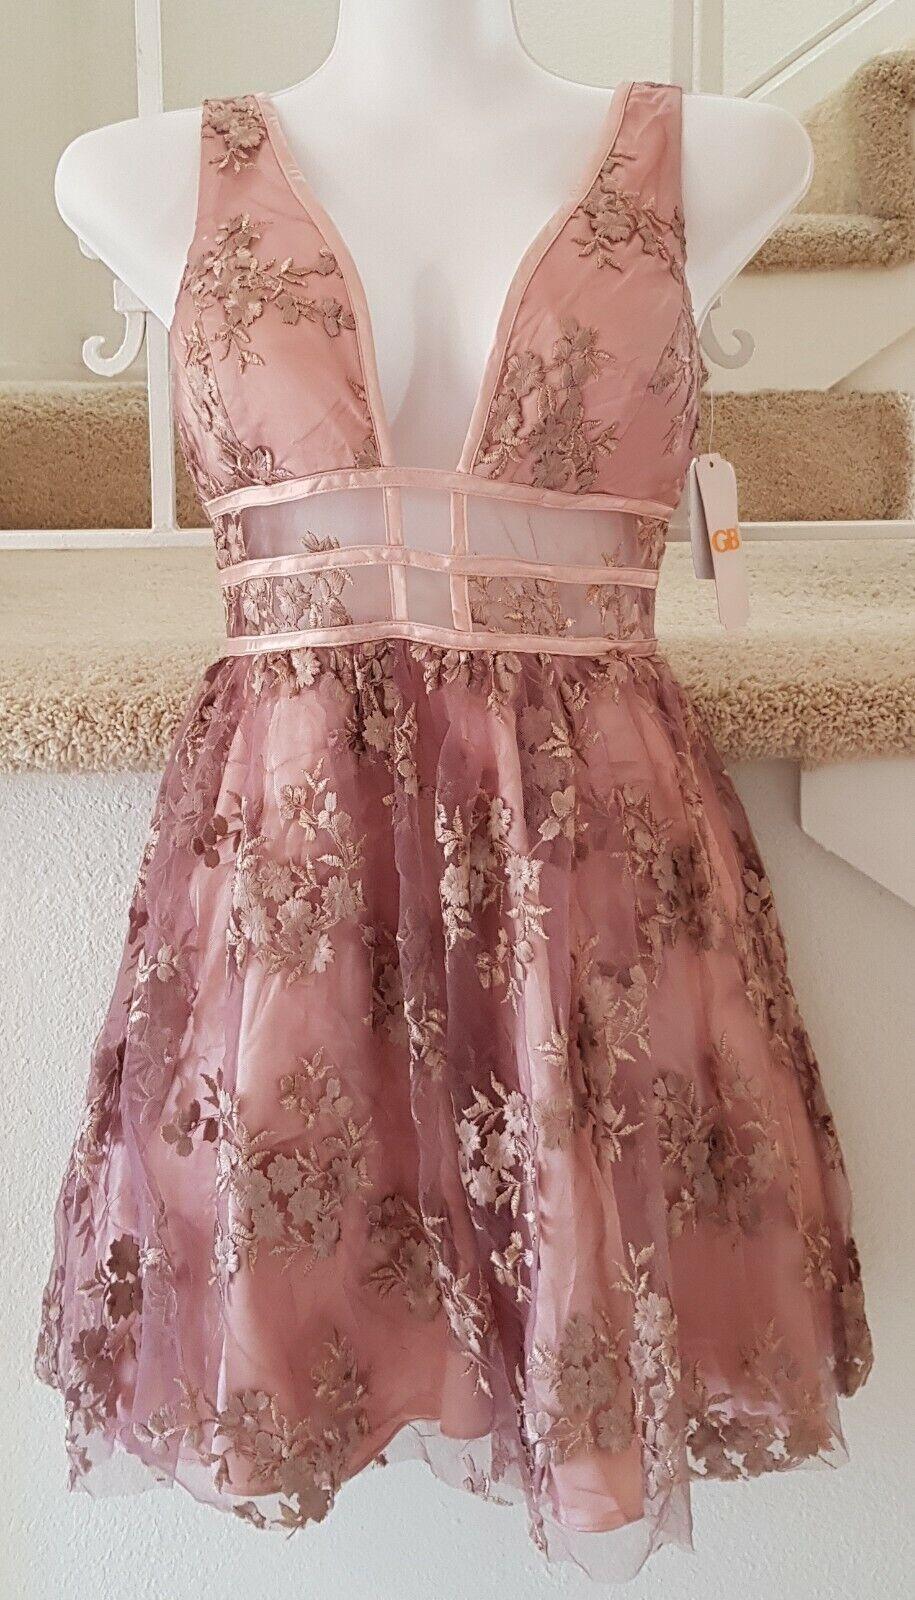 David & Bridal Prom Party Dress 9